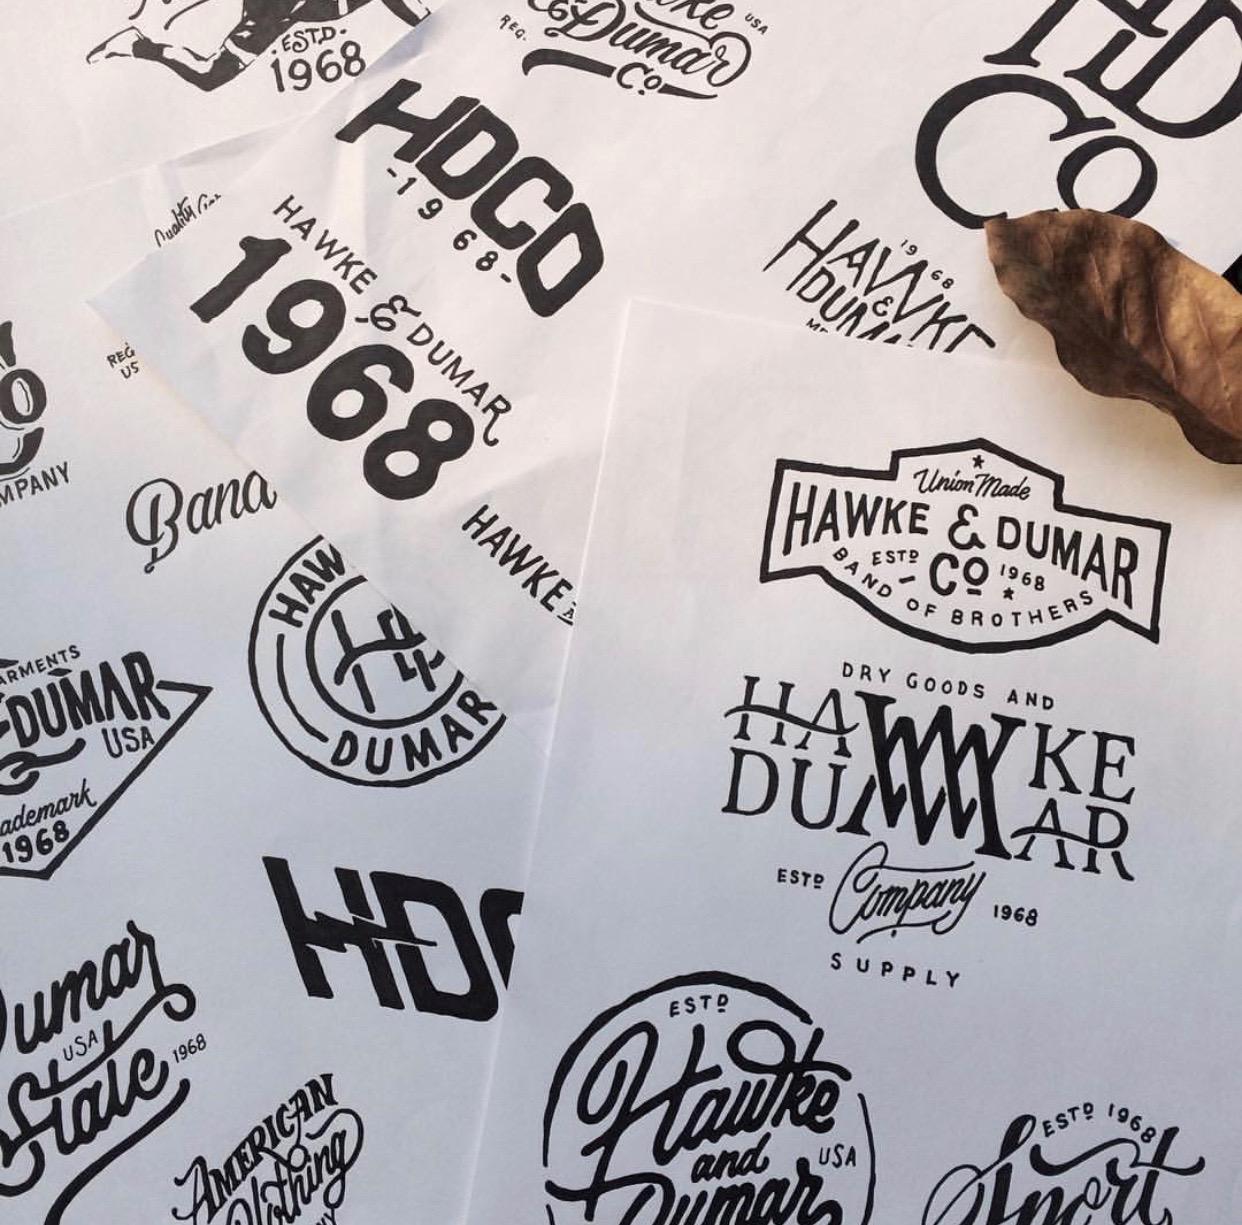 Hawkes & Dumar, lettering